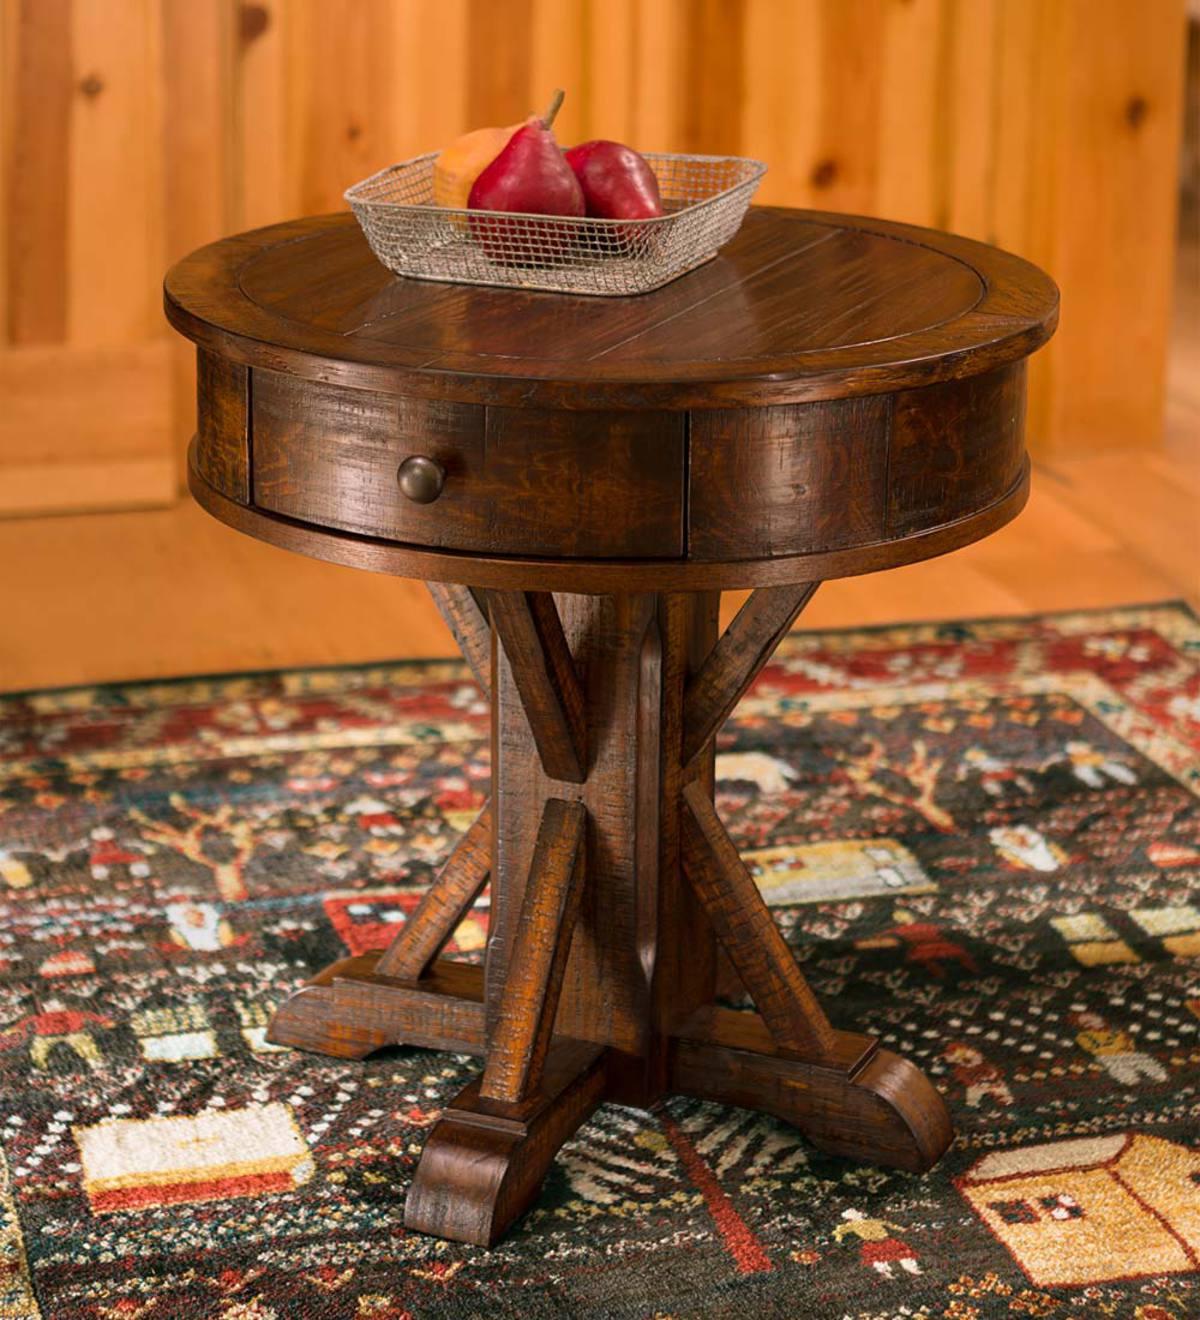 Gettysburg Round Pedestal Side Table In Oak Finish